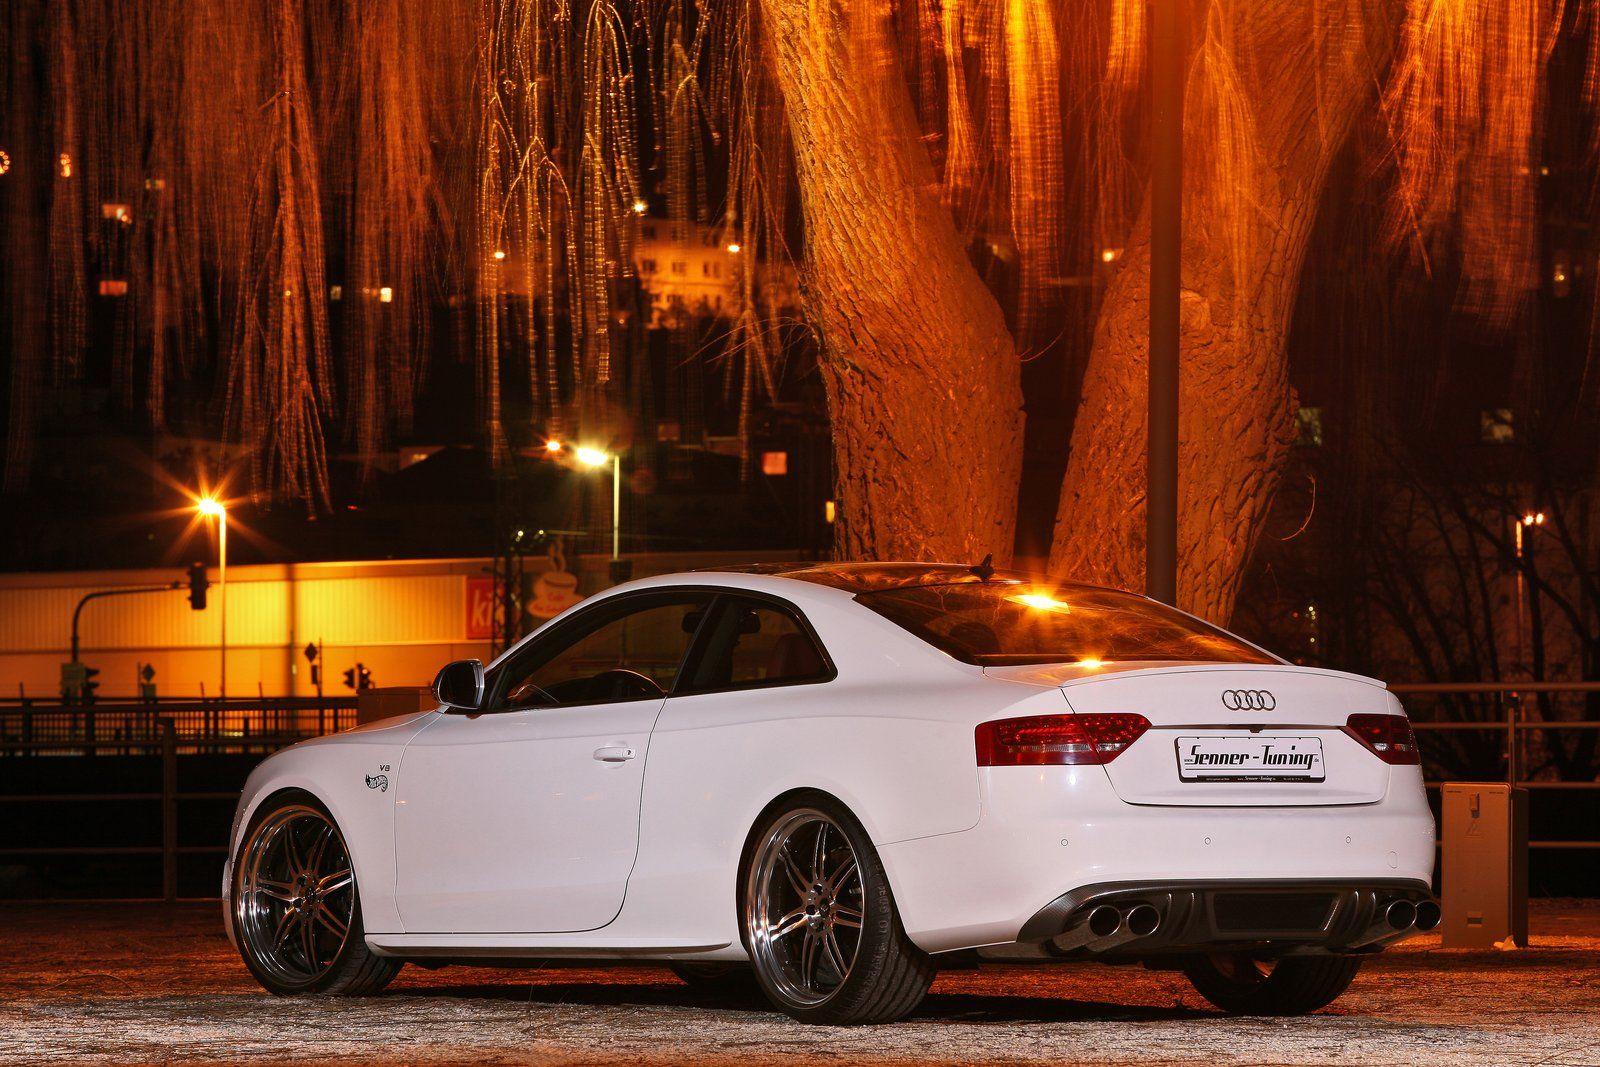 Senner%2BAudi%2BS5%2BWhite%2BBeast%2B9 Audi S5 Custom